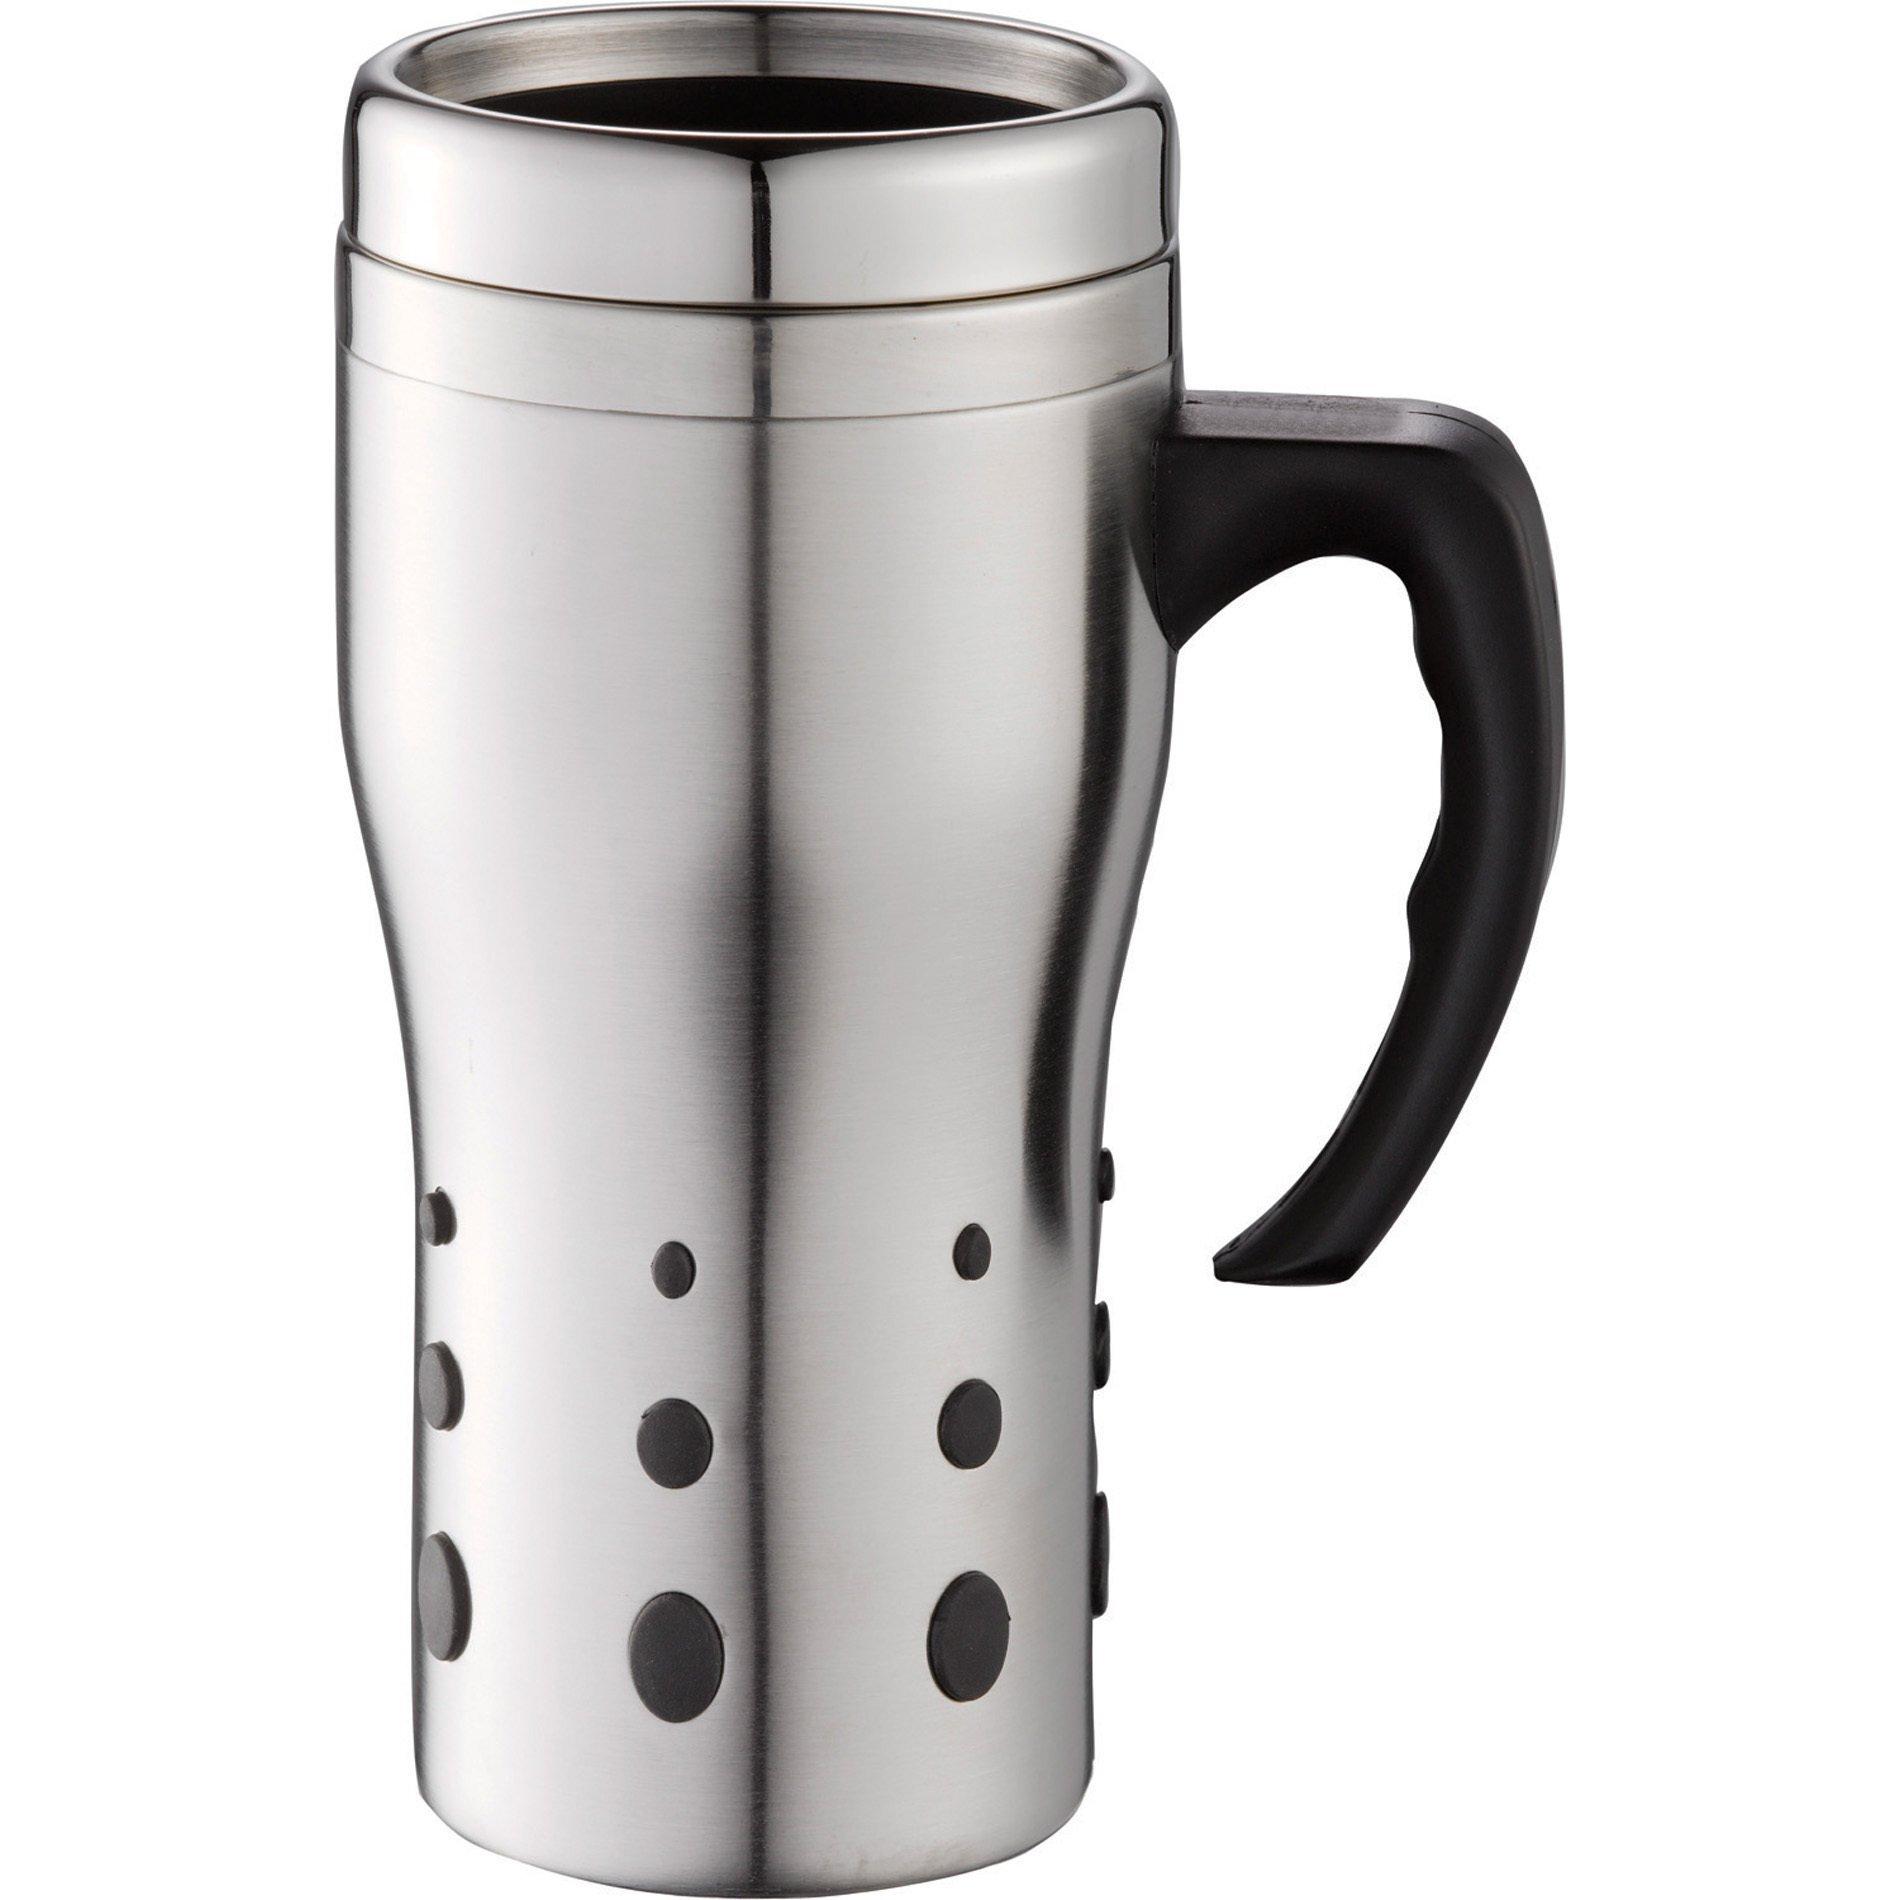 Terrano Stainless Steel Travel Mug, 16oz.